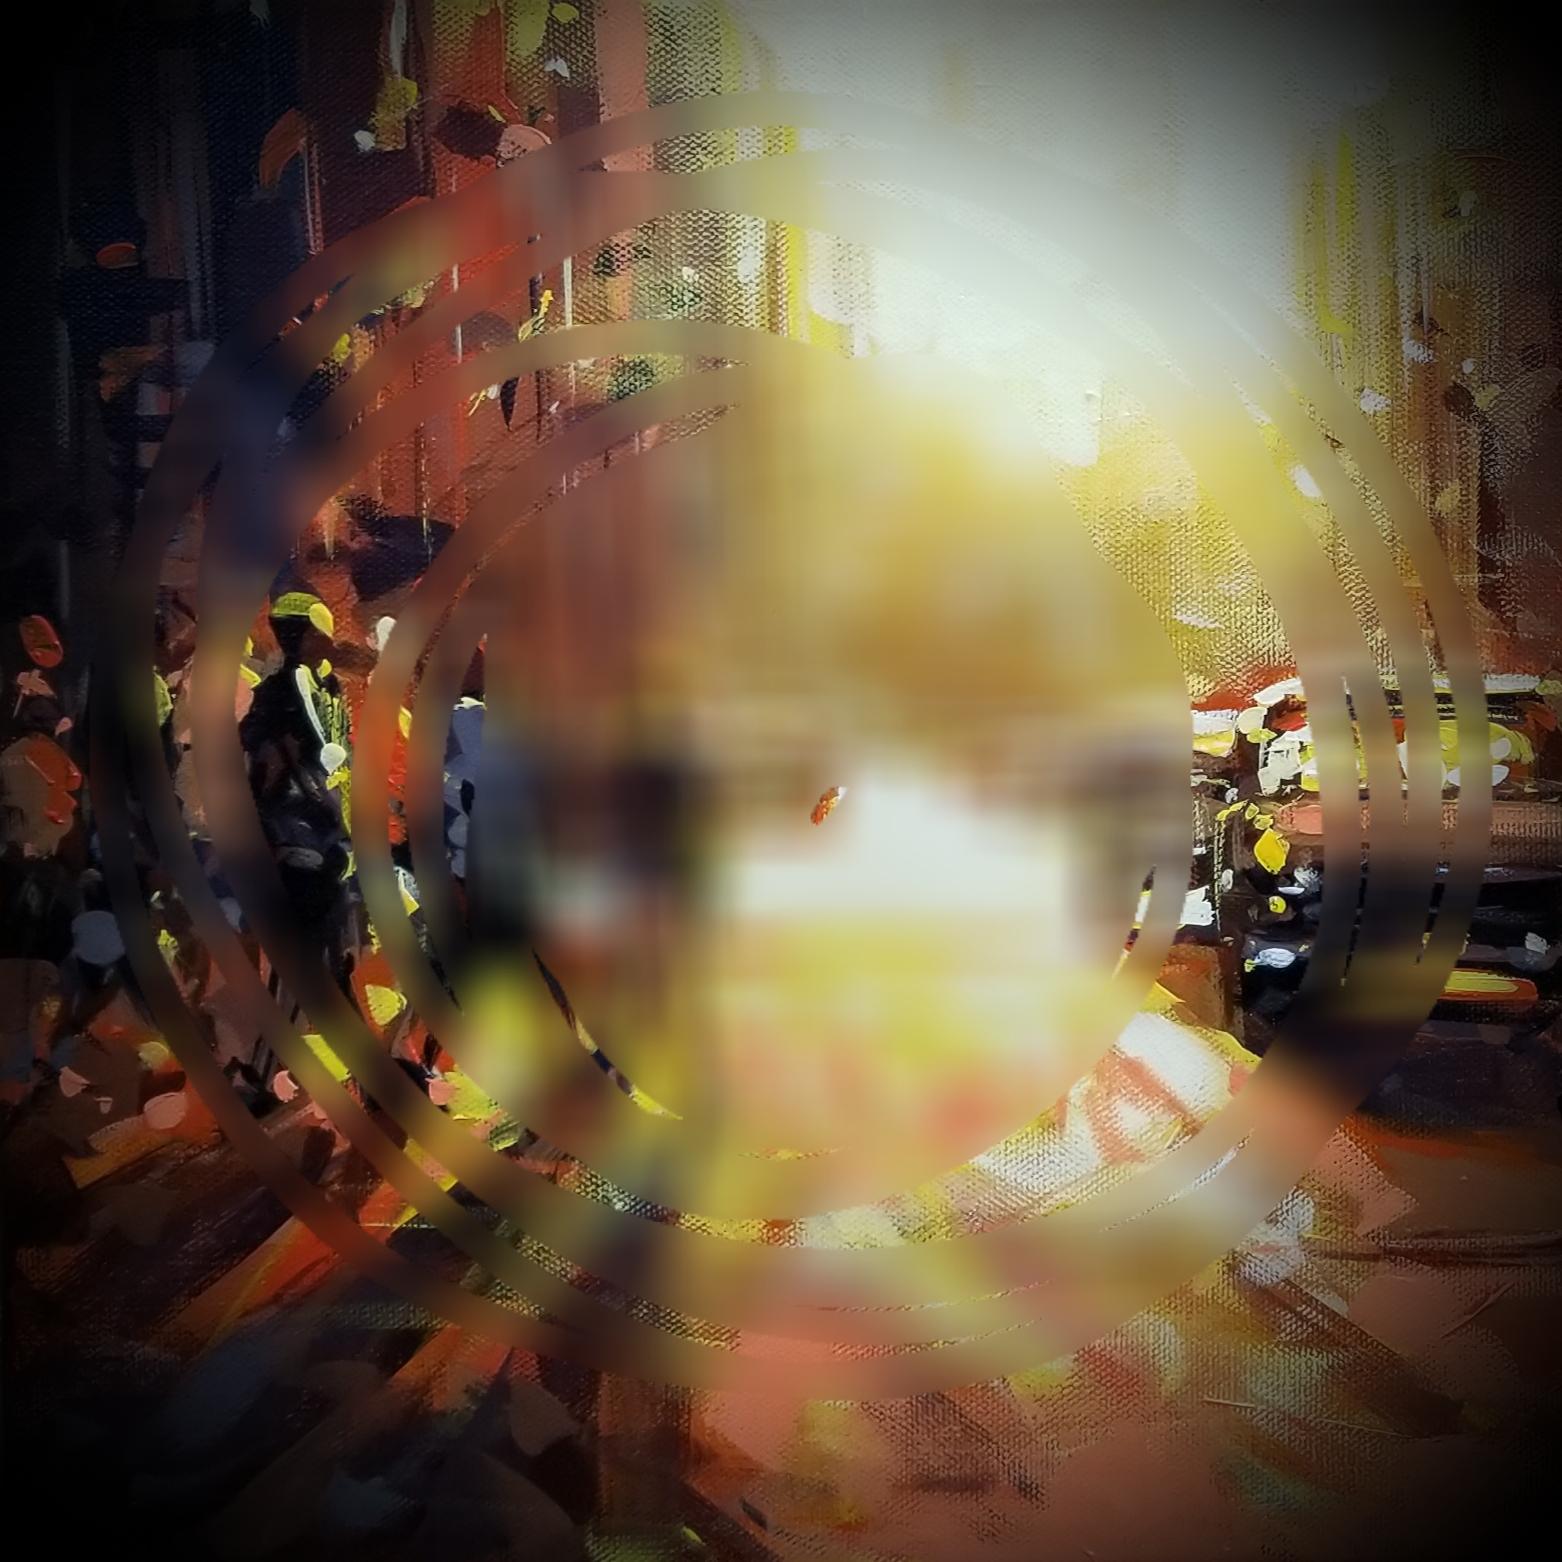 cityscape Arts - Life on the Light